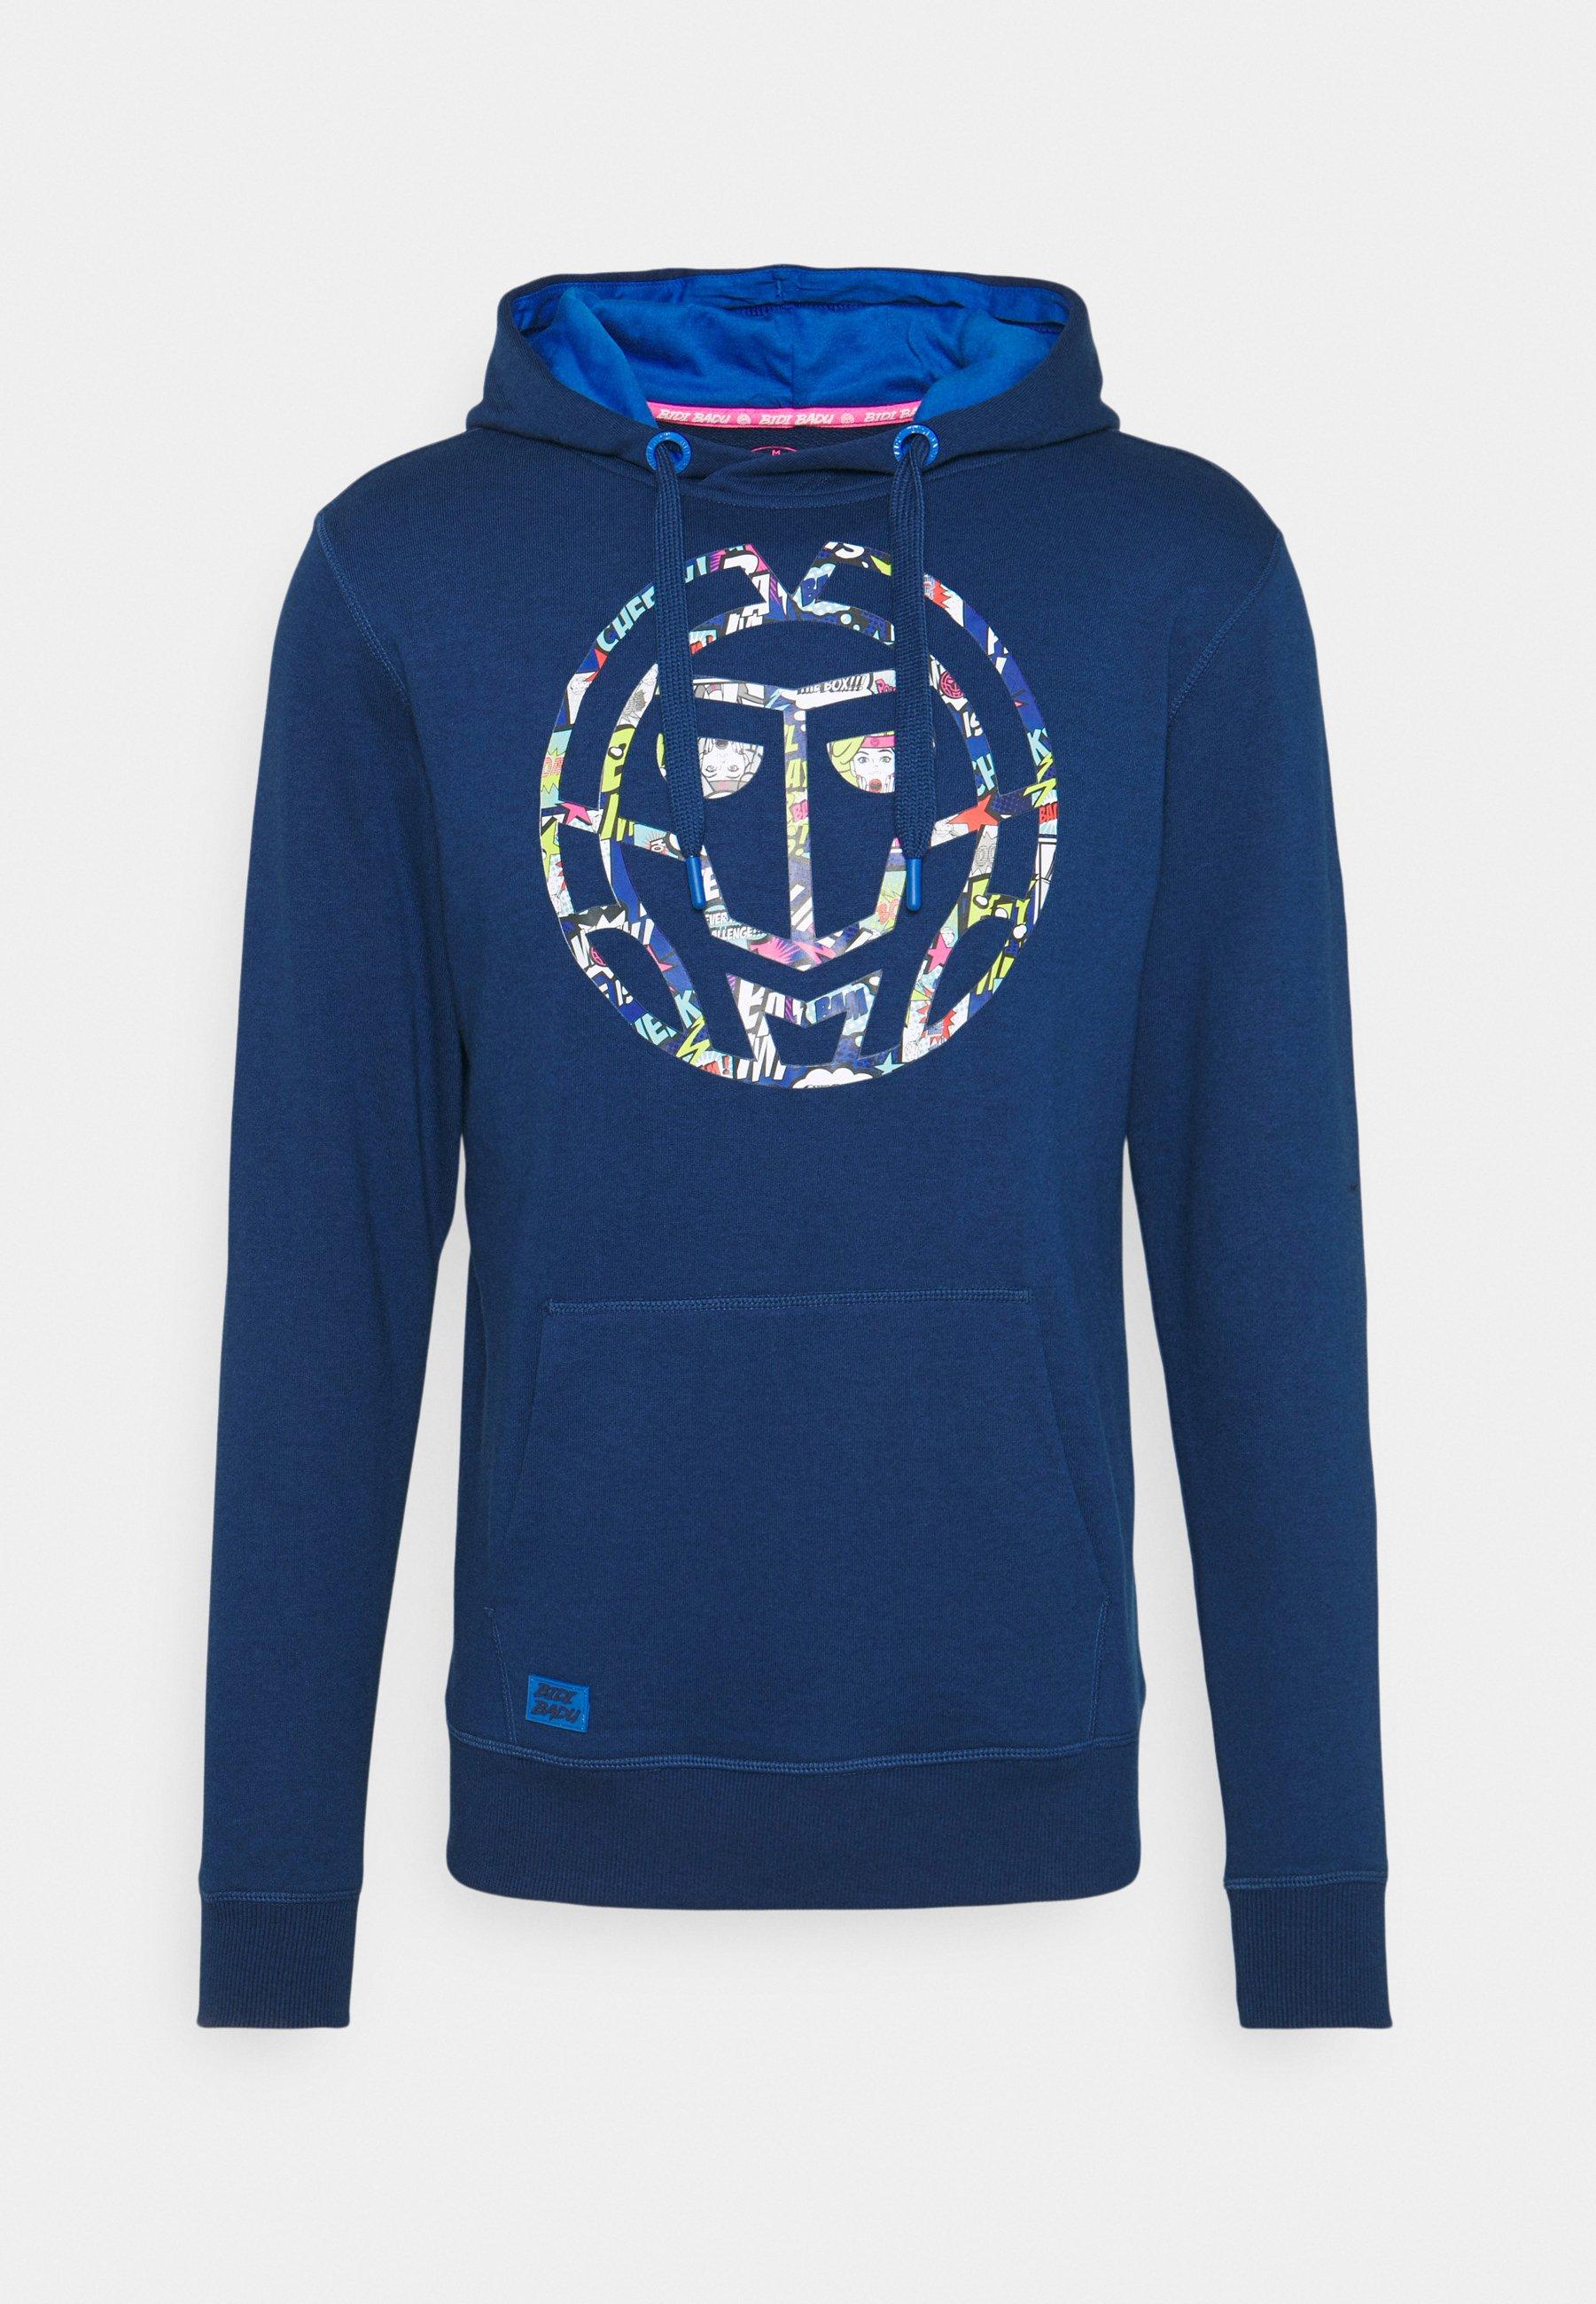 Homme OLAN LIFESTYLE HOODY - Sweatshirt